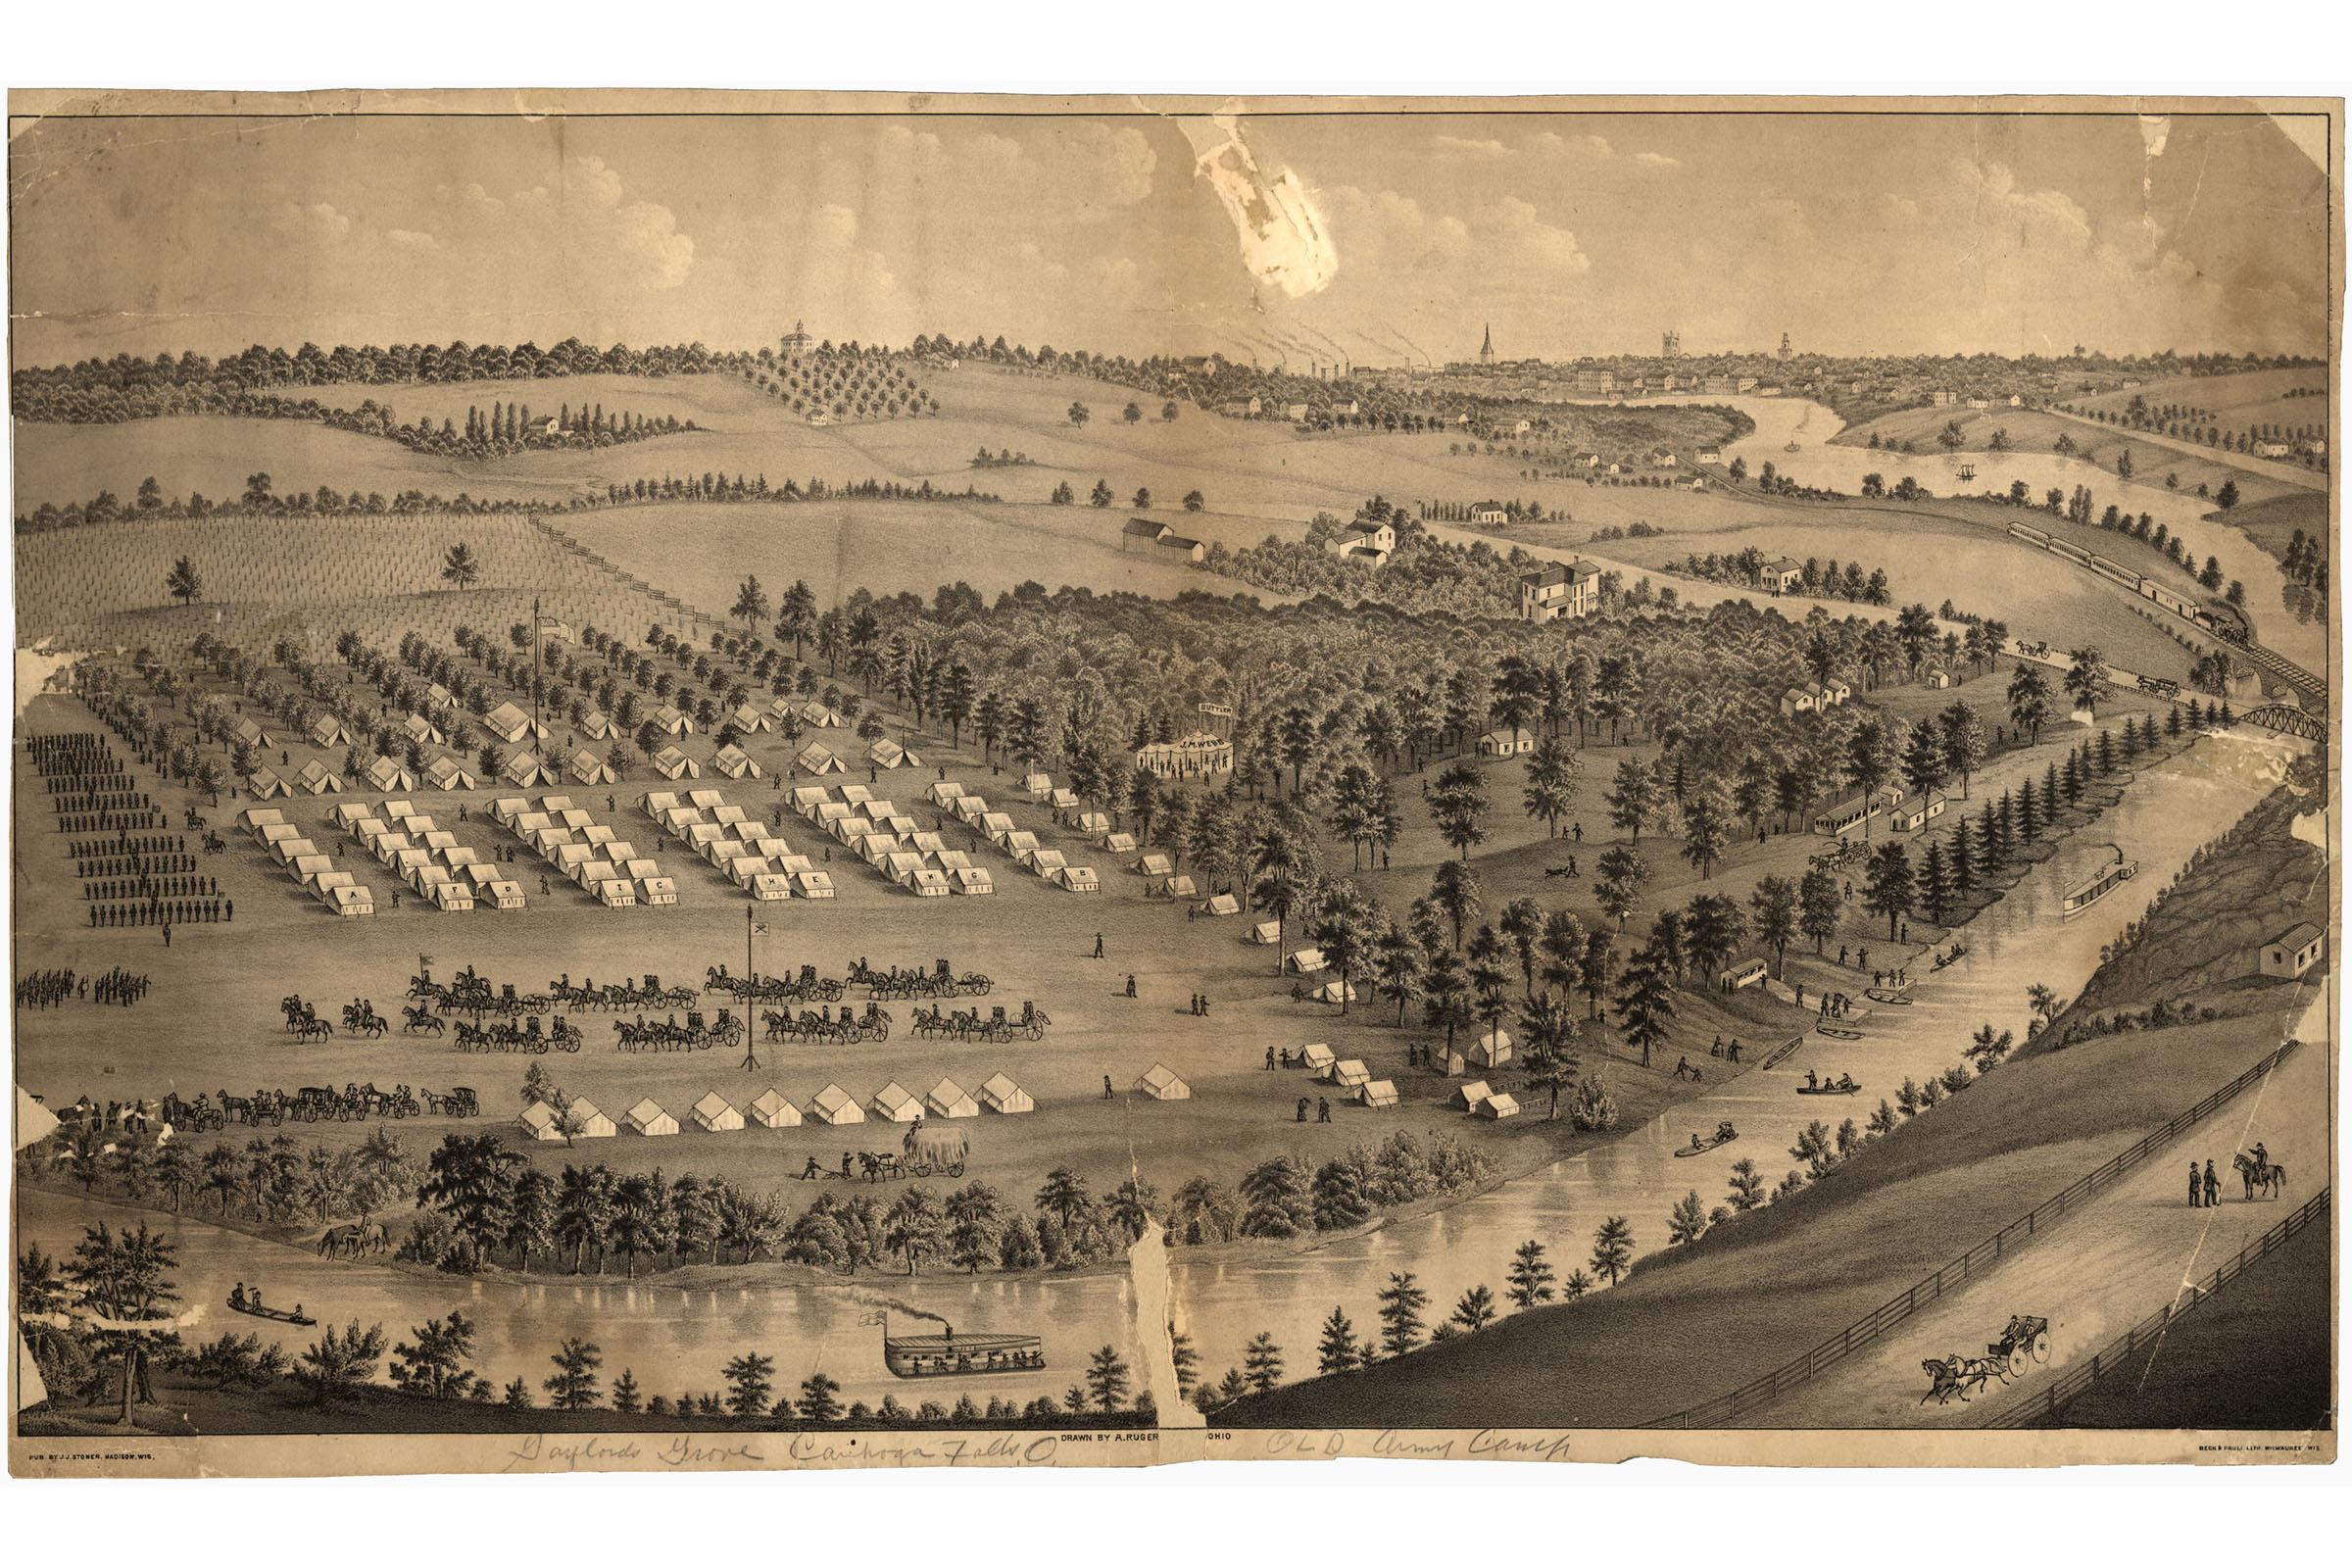 24x36 Vintage Reproduction Civil War Railroad Map Of South Carolina 1880